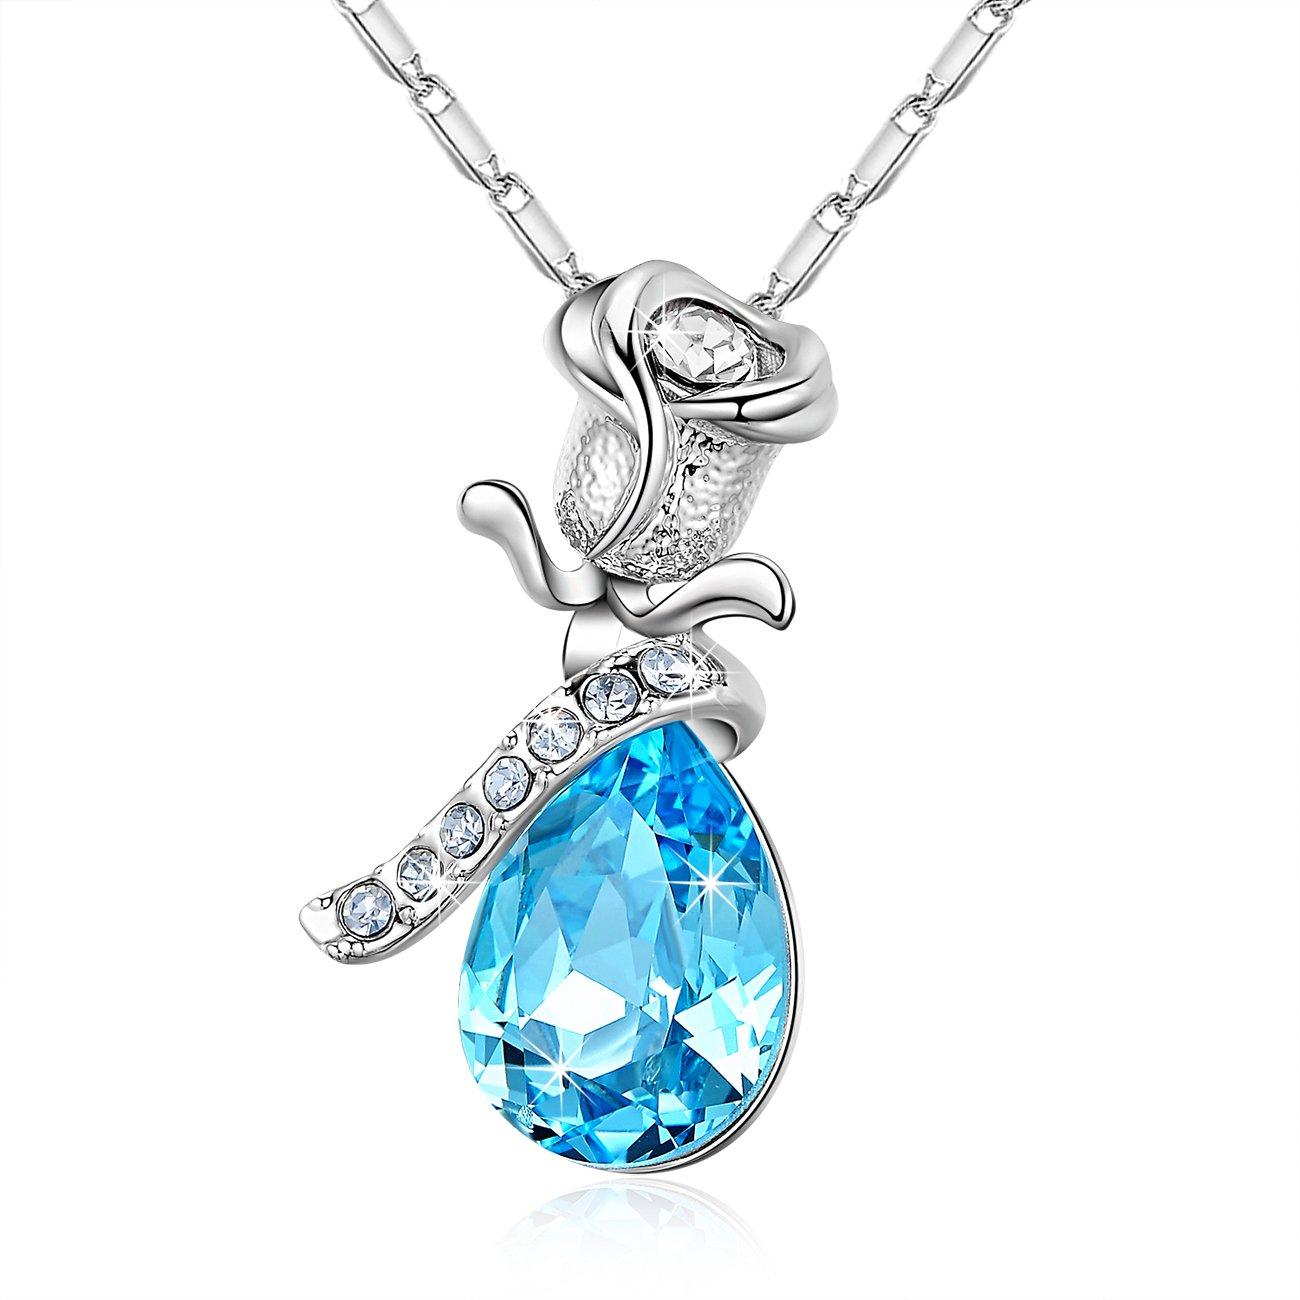 Pear-Shaped Crystal Necklace NinaMaid Love's Rose Teardrop Pendant Gift Ideas 18 Inch Blue